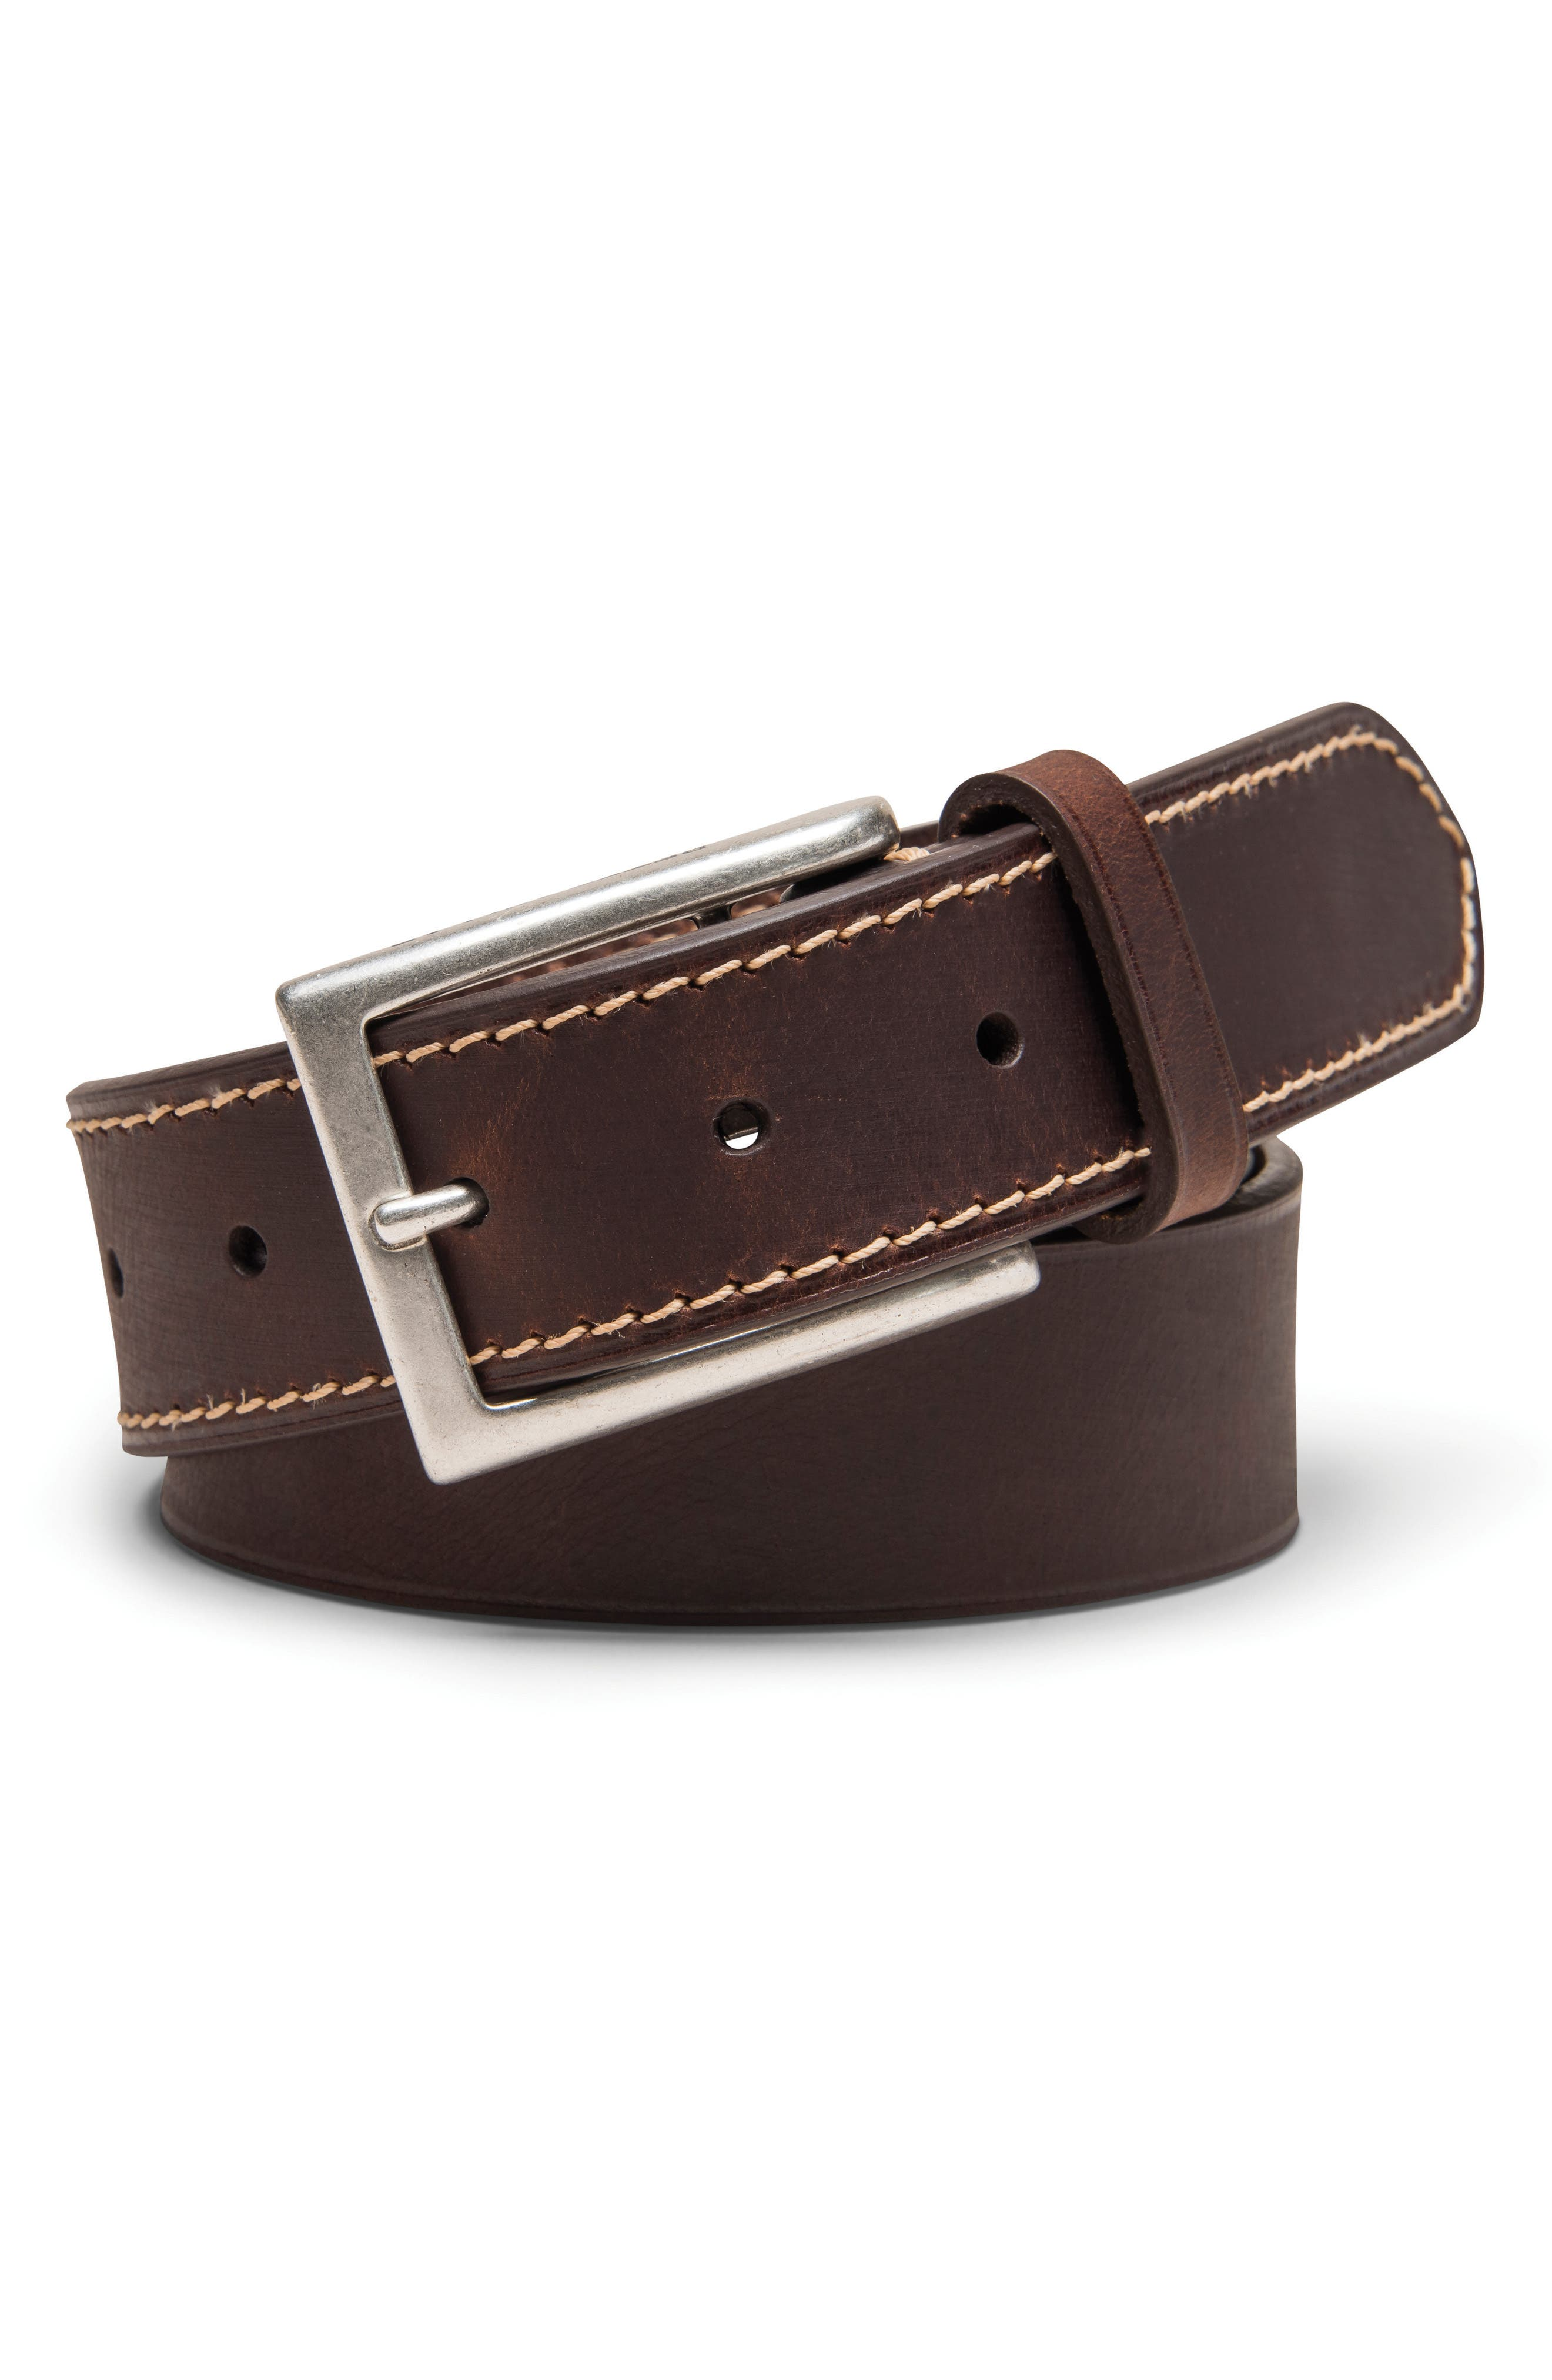 Contrast Stitch Leather Belt,                             Main thumbnail 1, color,                             202